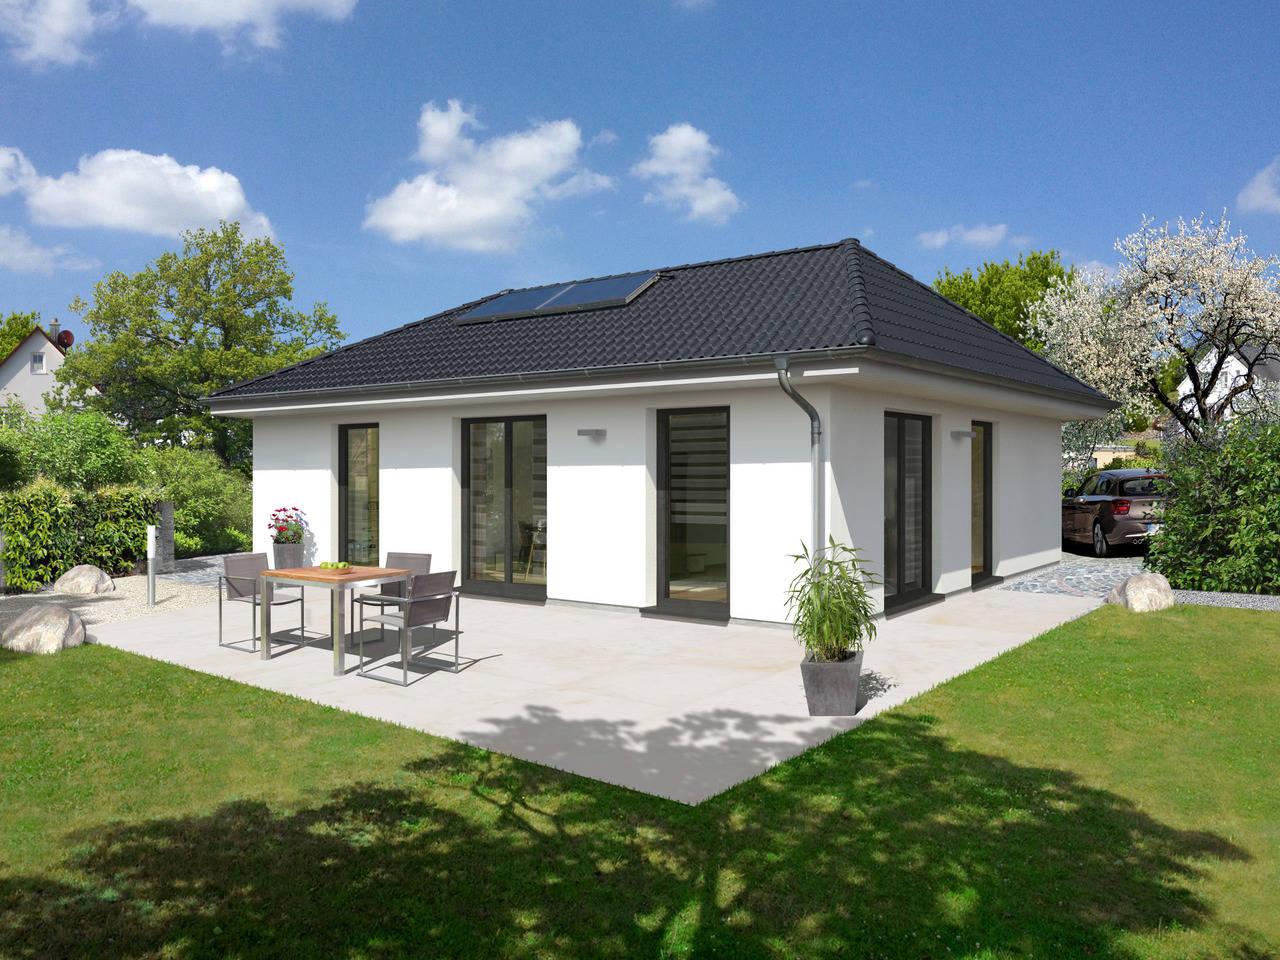 Bungalow 92 von Nico Jacobs Eigenheimbau - Town & Country Partner